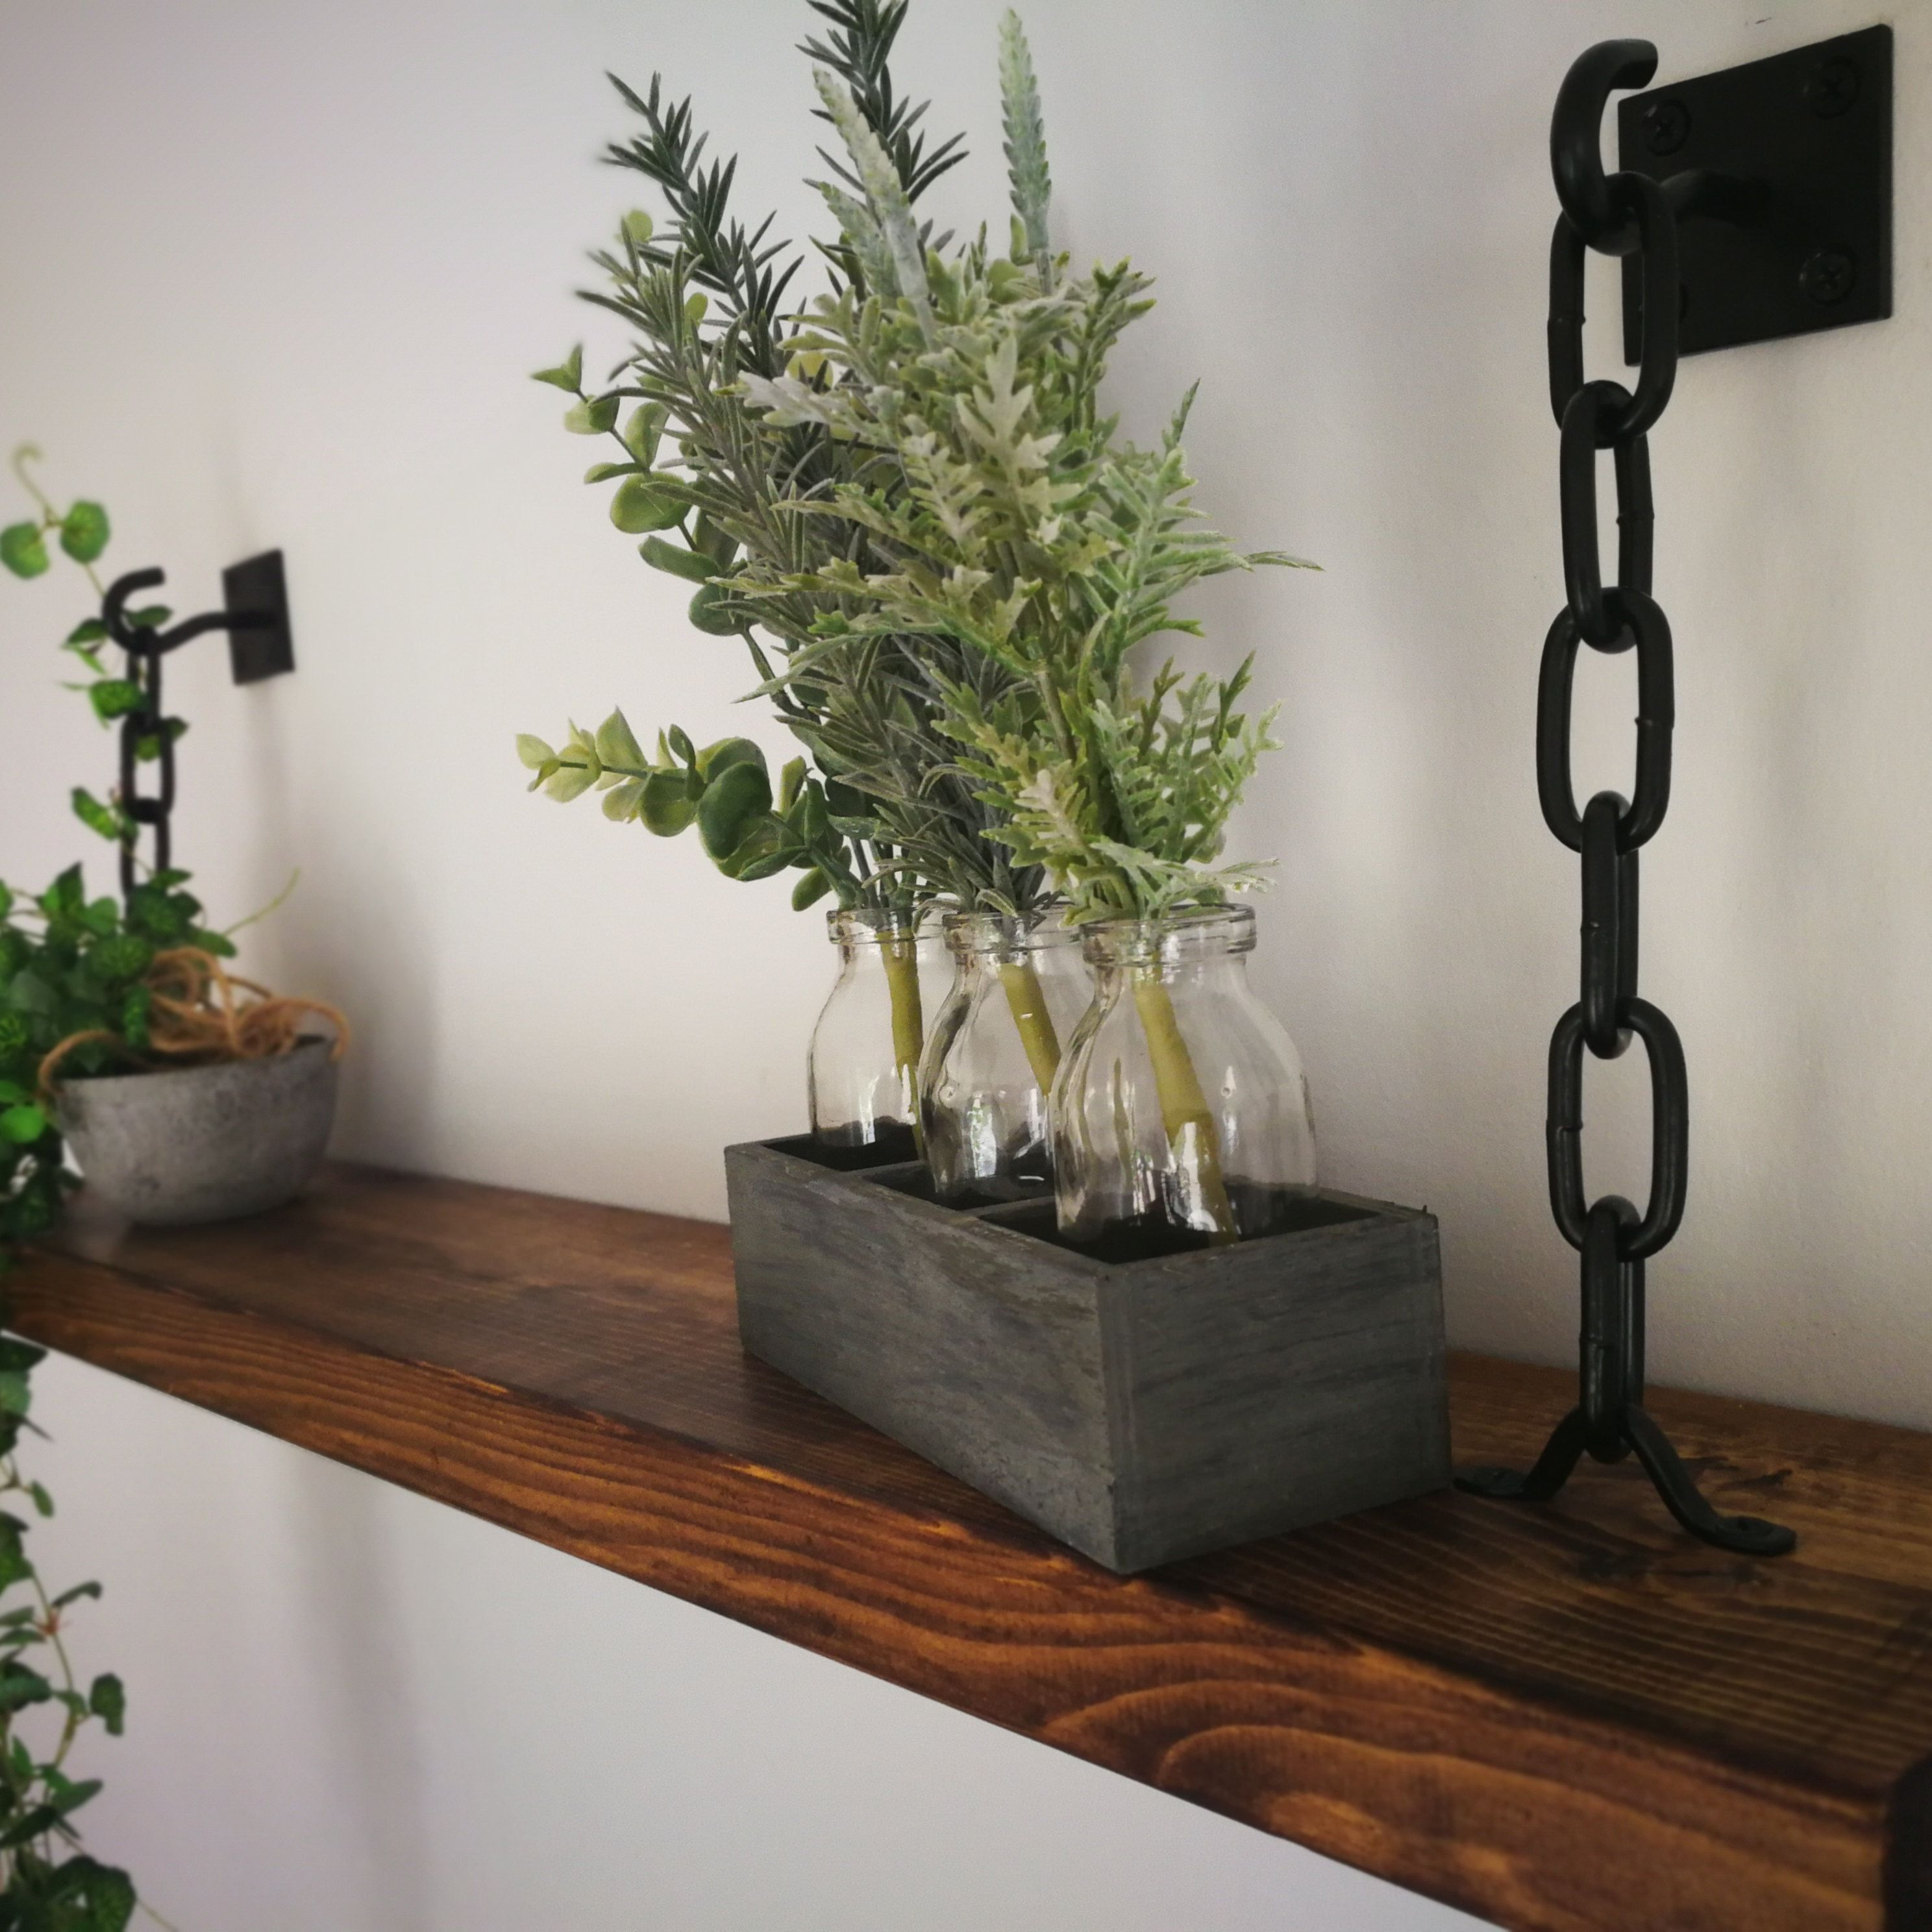 Rustic Handmade Solid Black Steel Chain Floating Shelves